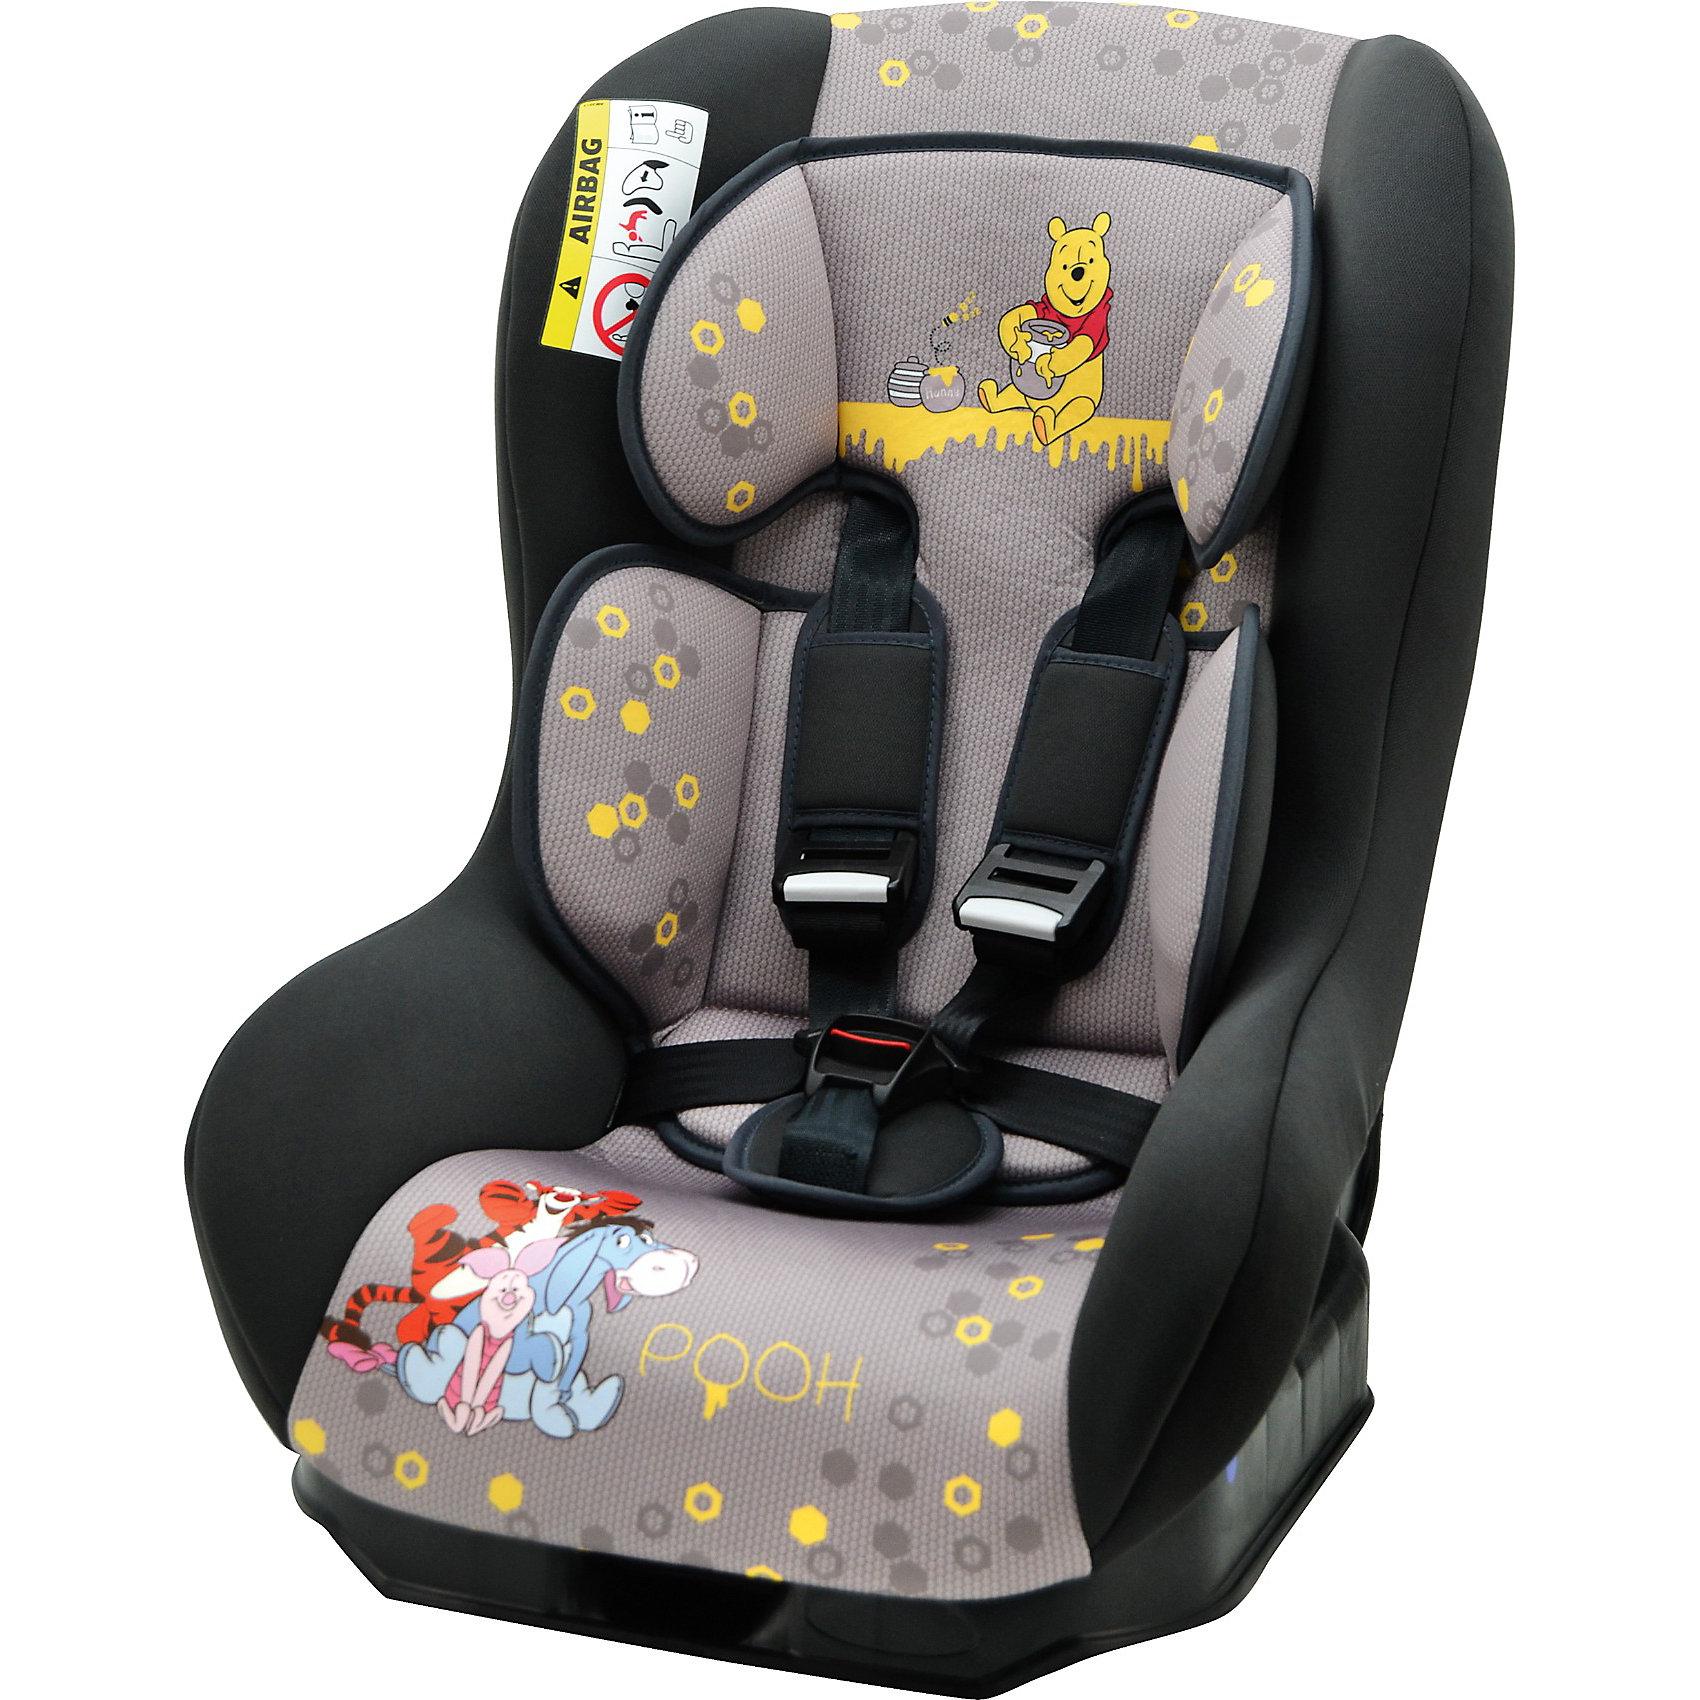 Автокресло Nania Driver, 0-18 кг, winnie the pooh